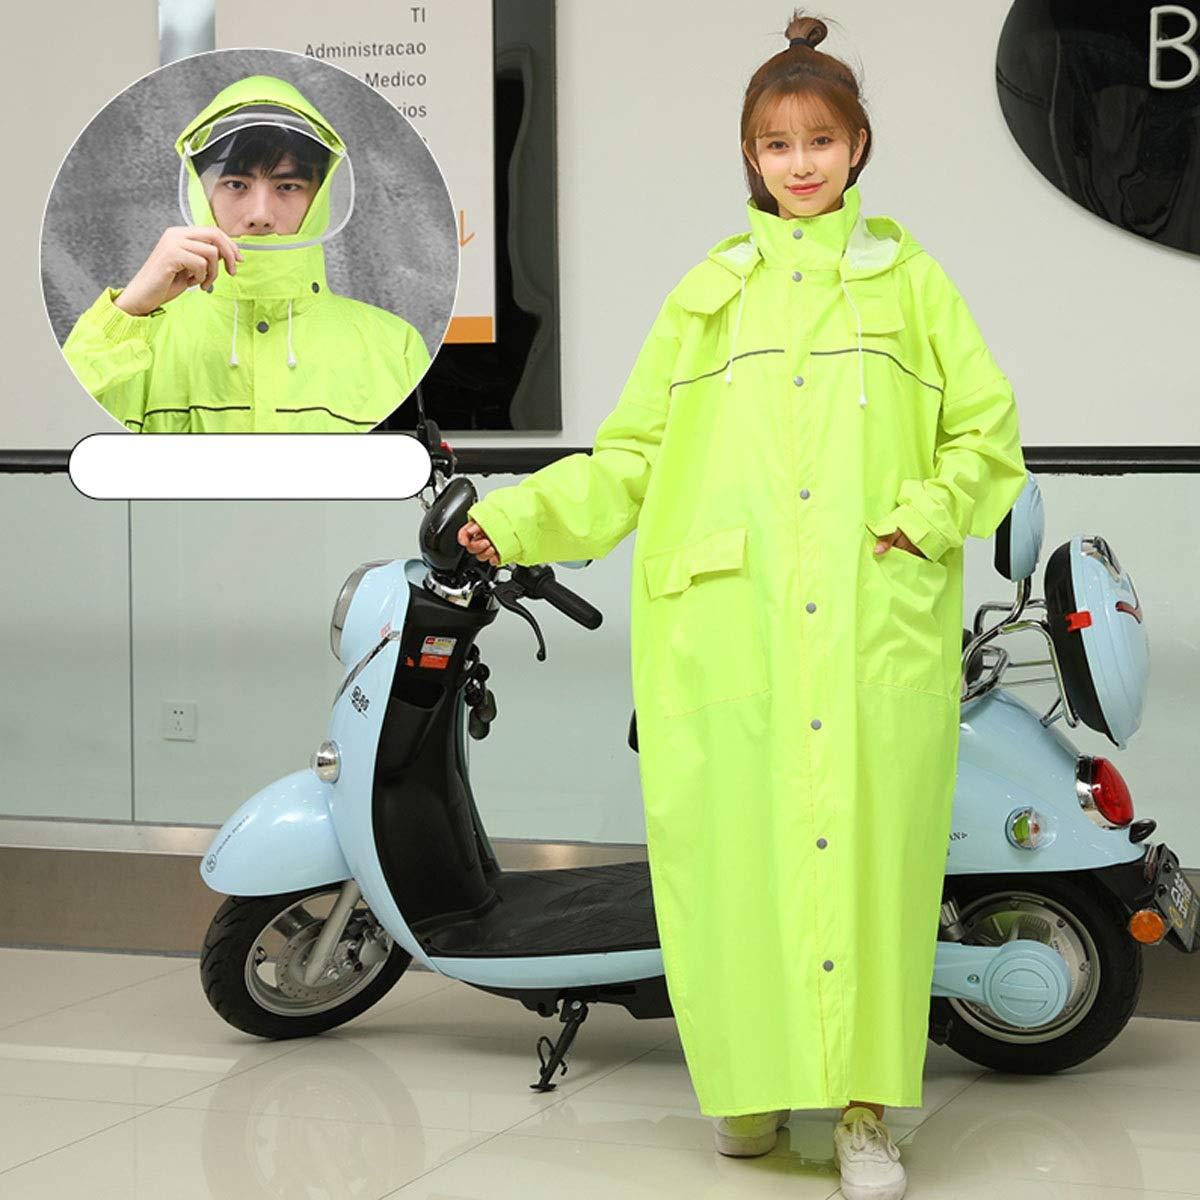 GUYUEXUAN Raincoat, Full Body Raincoat, Riding Hiking Raincoat, Multiple Colors Products 3 (Size : XXXL, Style : F)